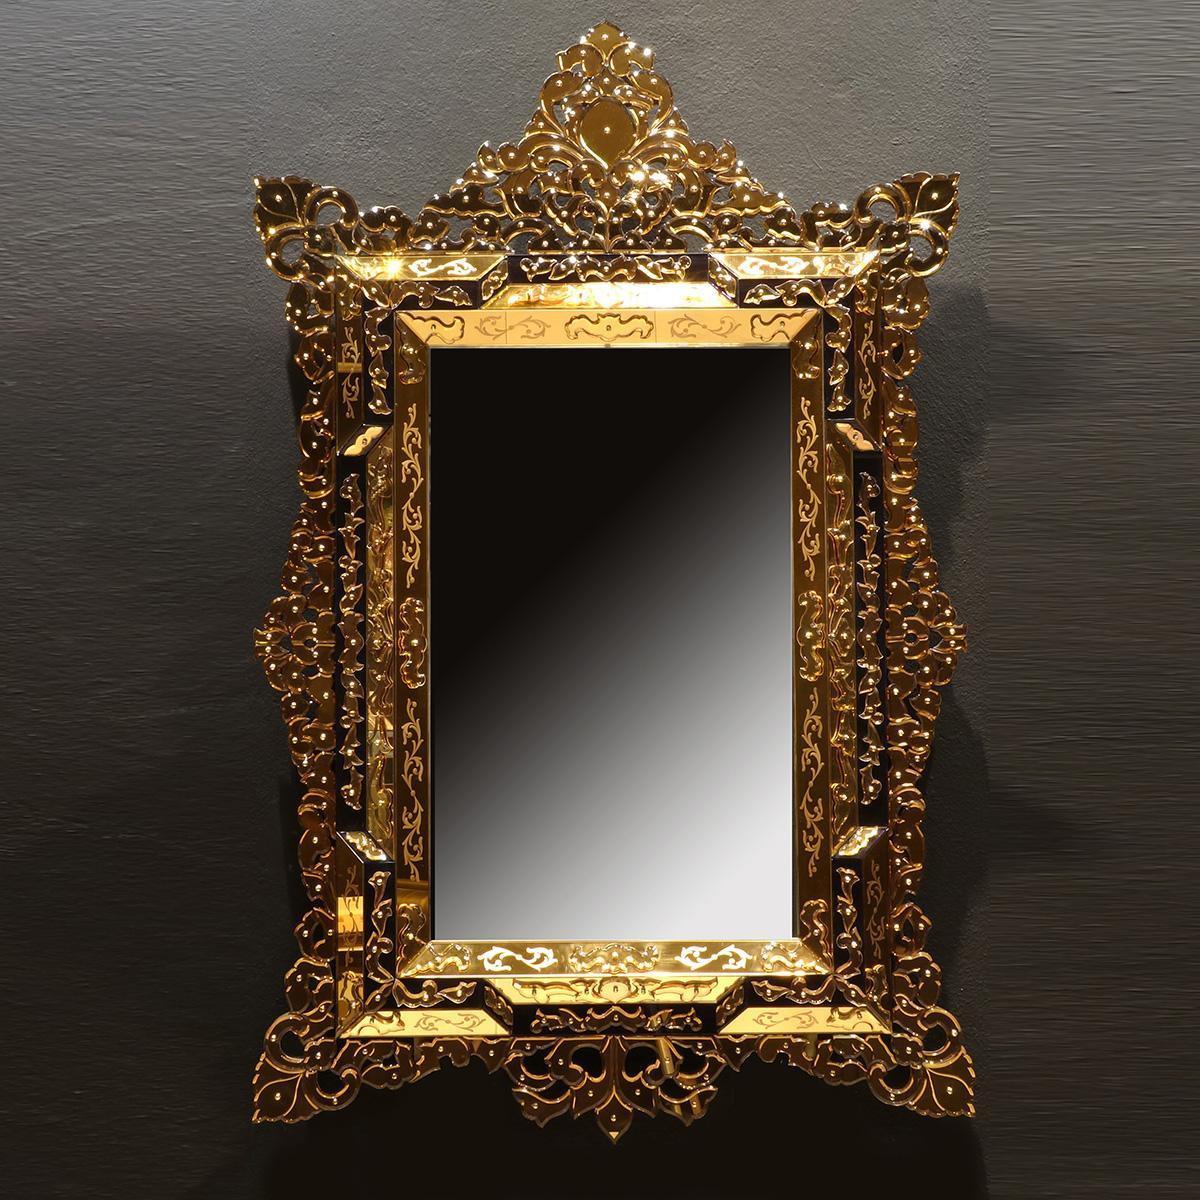 """Aladina"" Murano glas venezianischen spiegel"